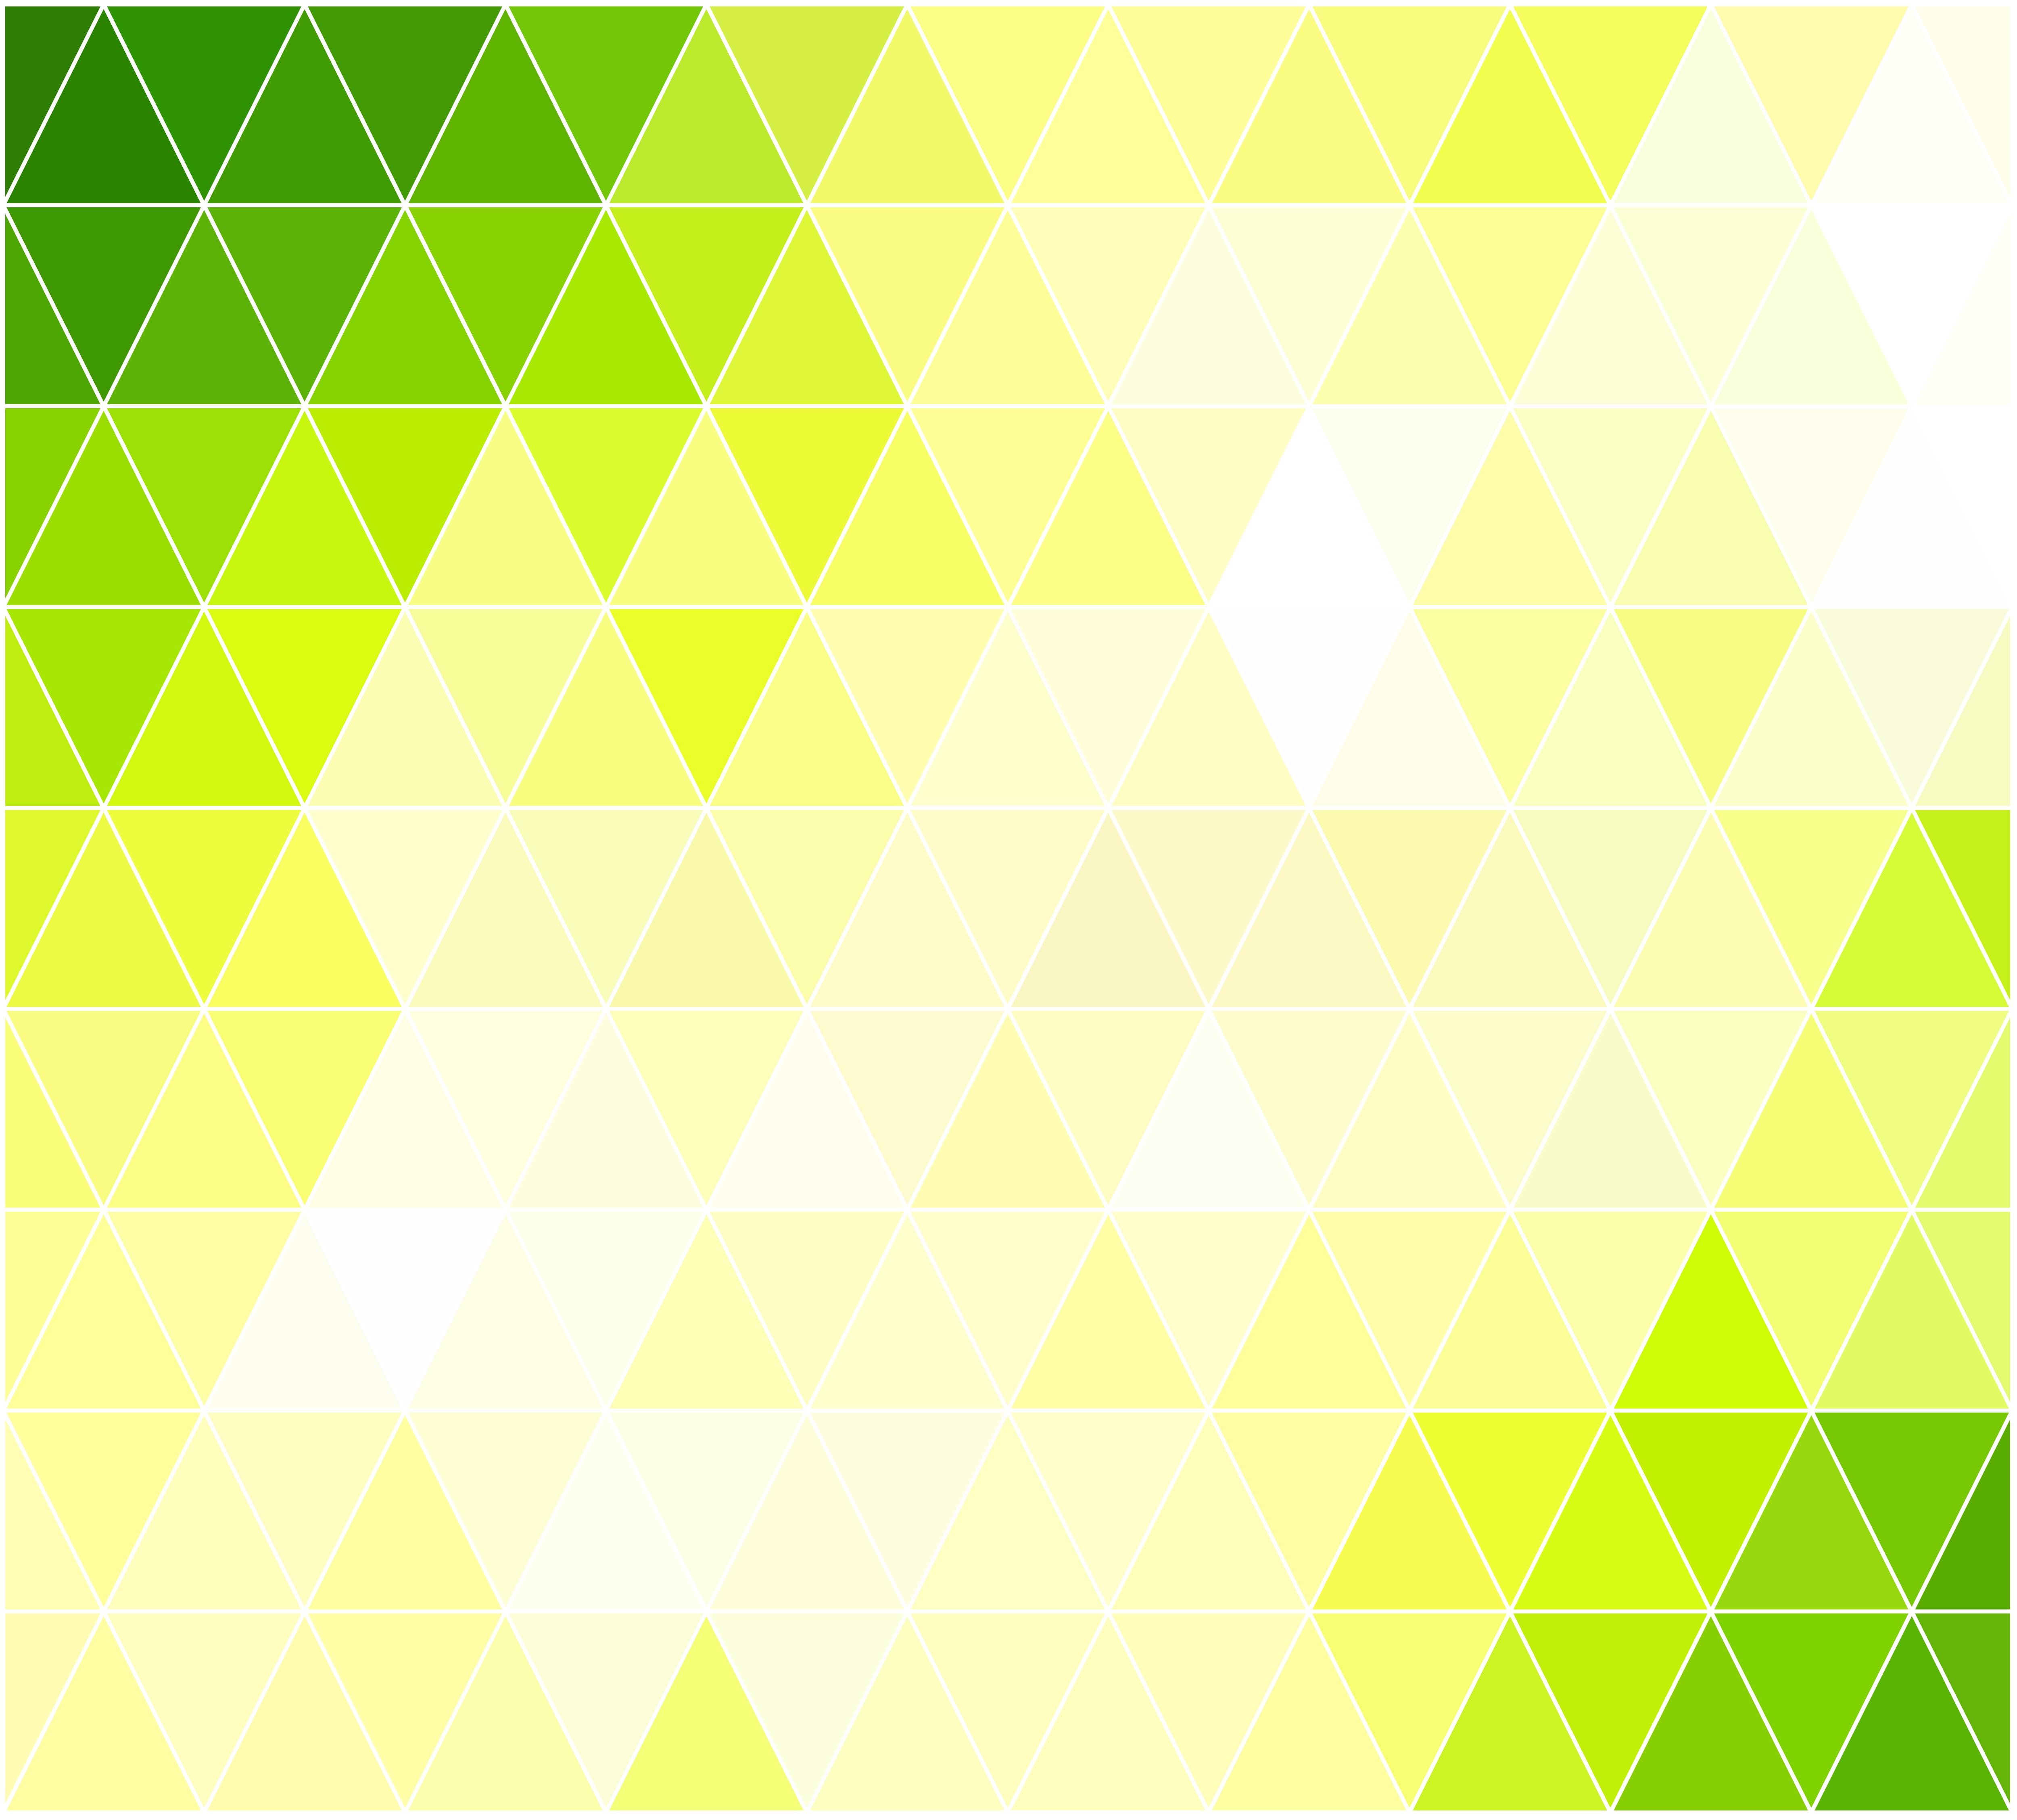 Green Grid Mosaic Background, Creative Design Templates ...